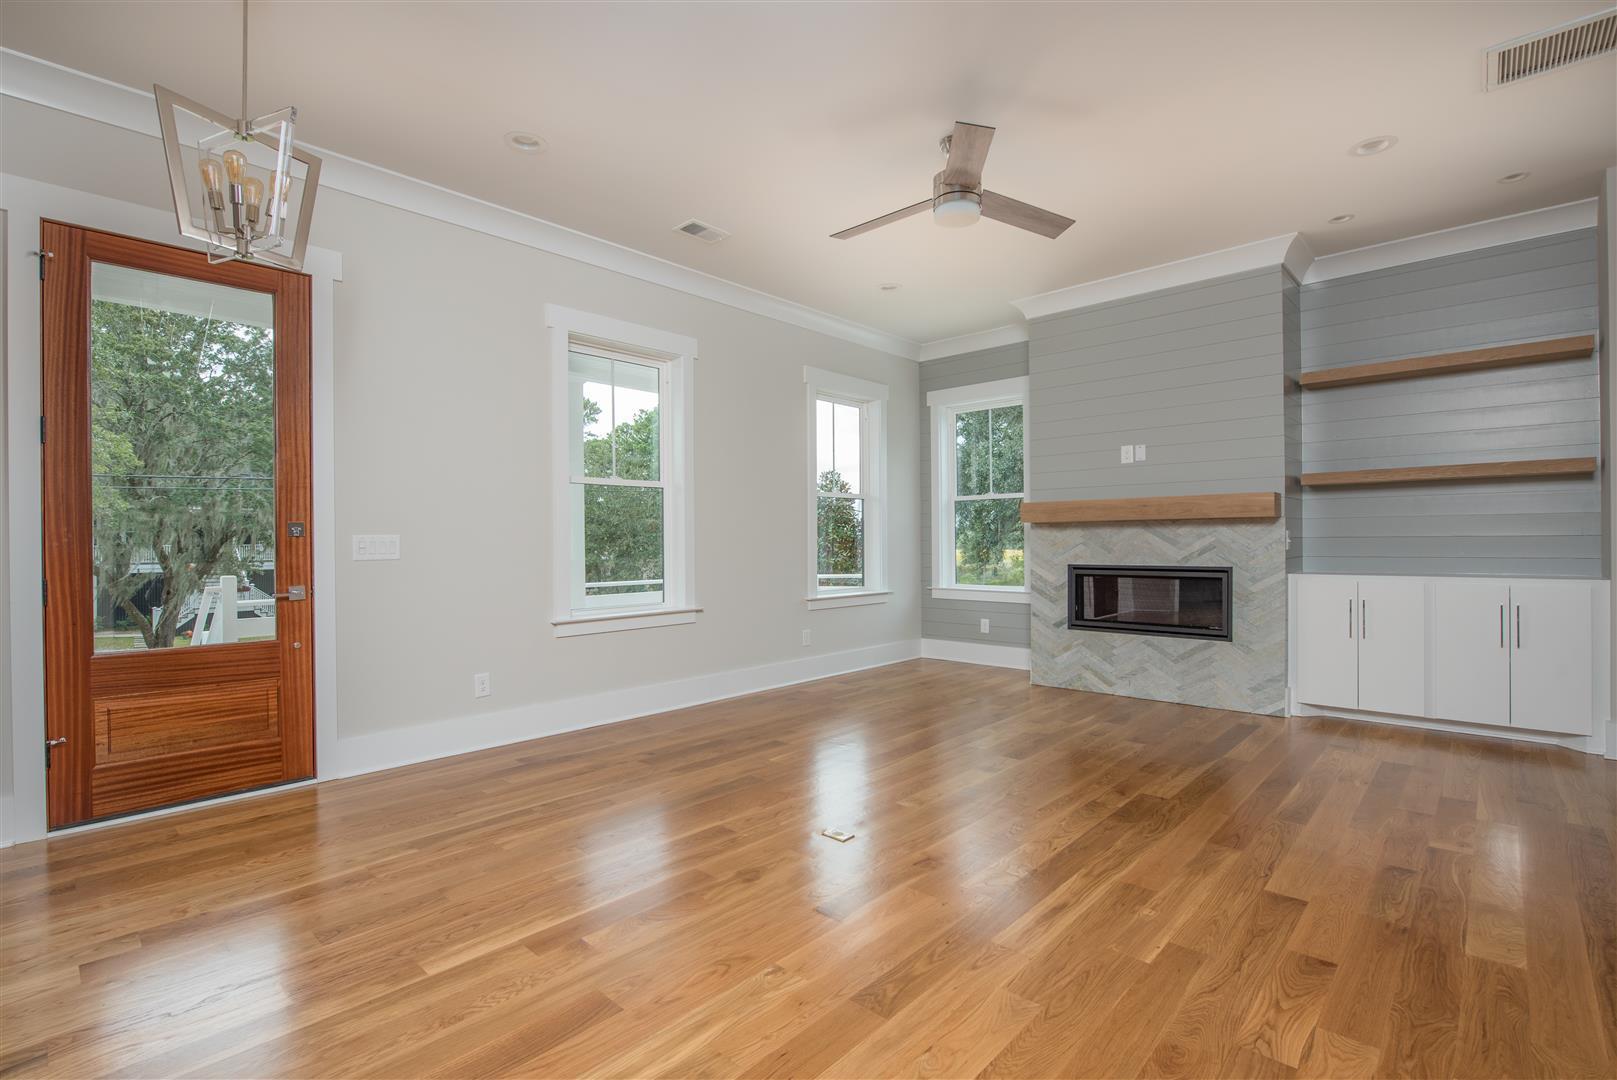 Scanlonville Homes For Sale - 160 5th, Mount Pleasant, SC - 16